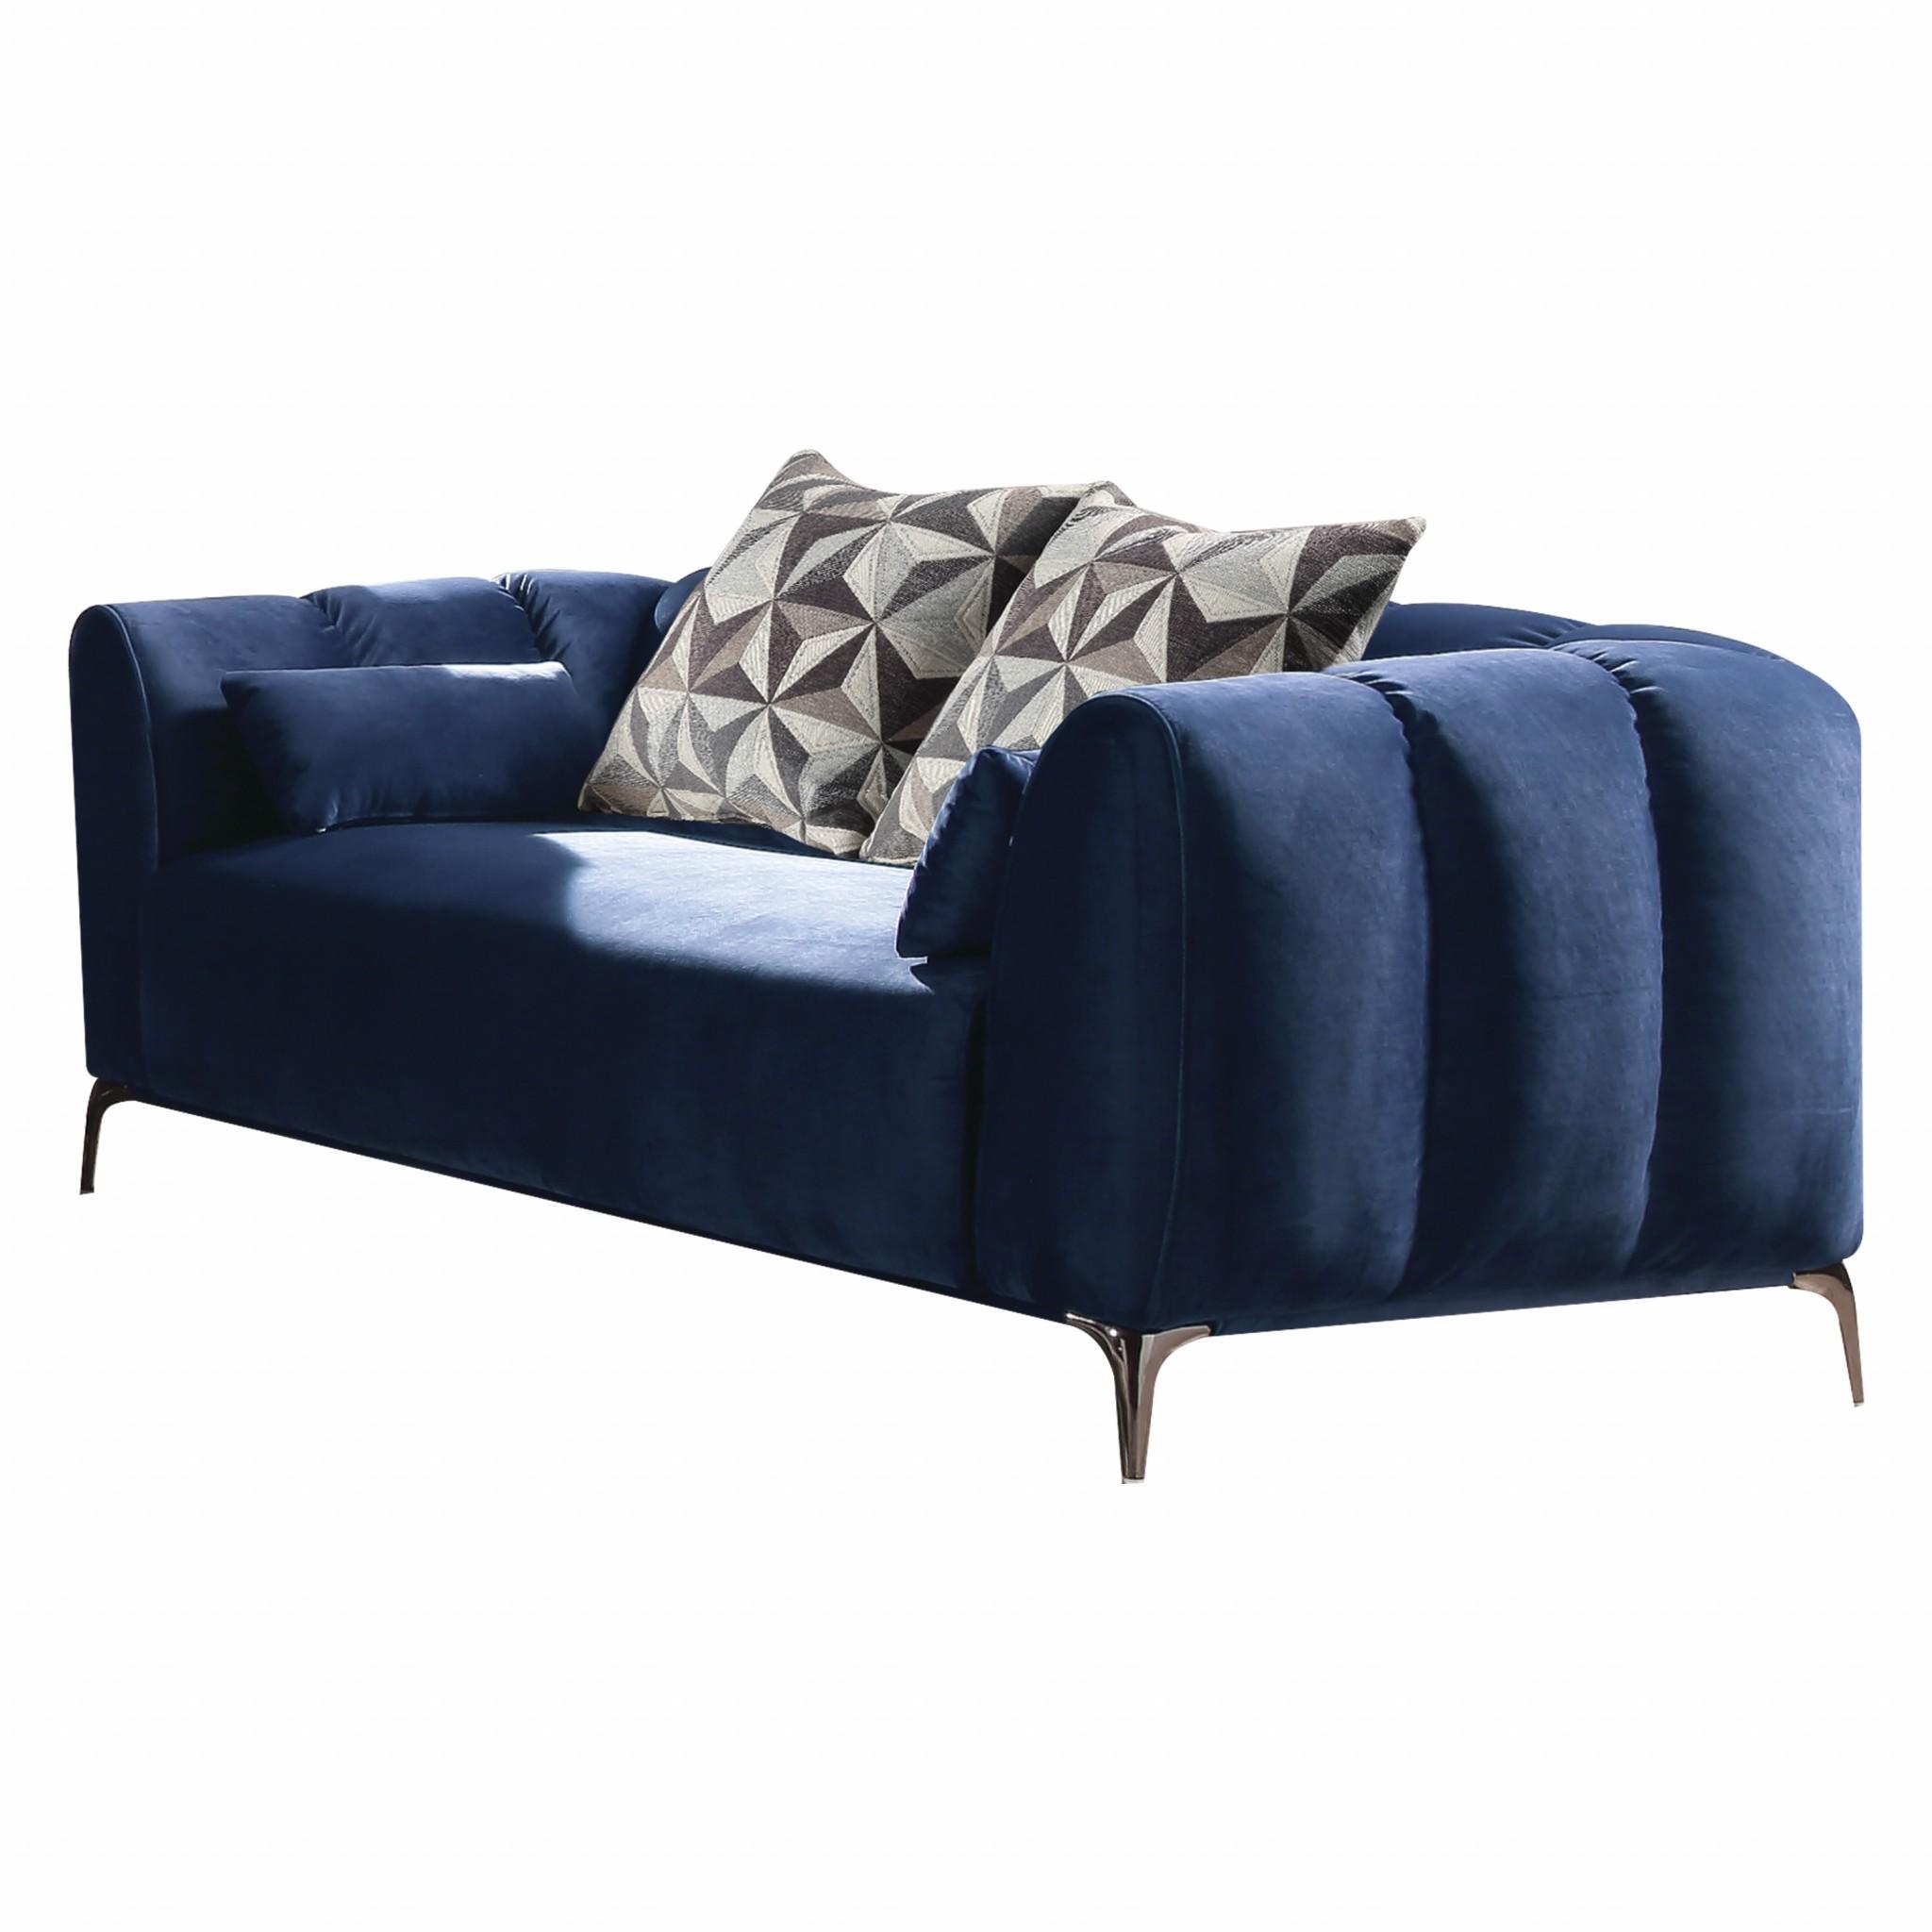 Marvelous 80 X 42 X 31 Blue Velvet Loveseat Squirreltailoven Fun Painted Chair Ideas Images Squirreltailovenorg